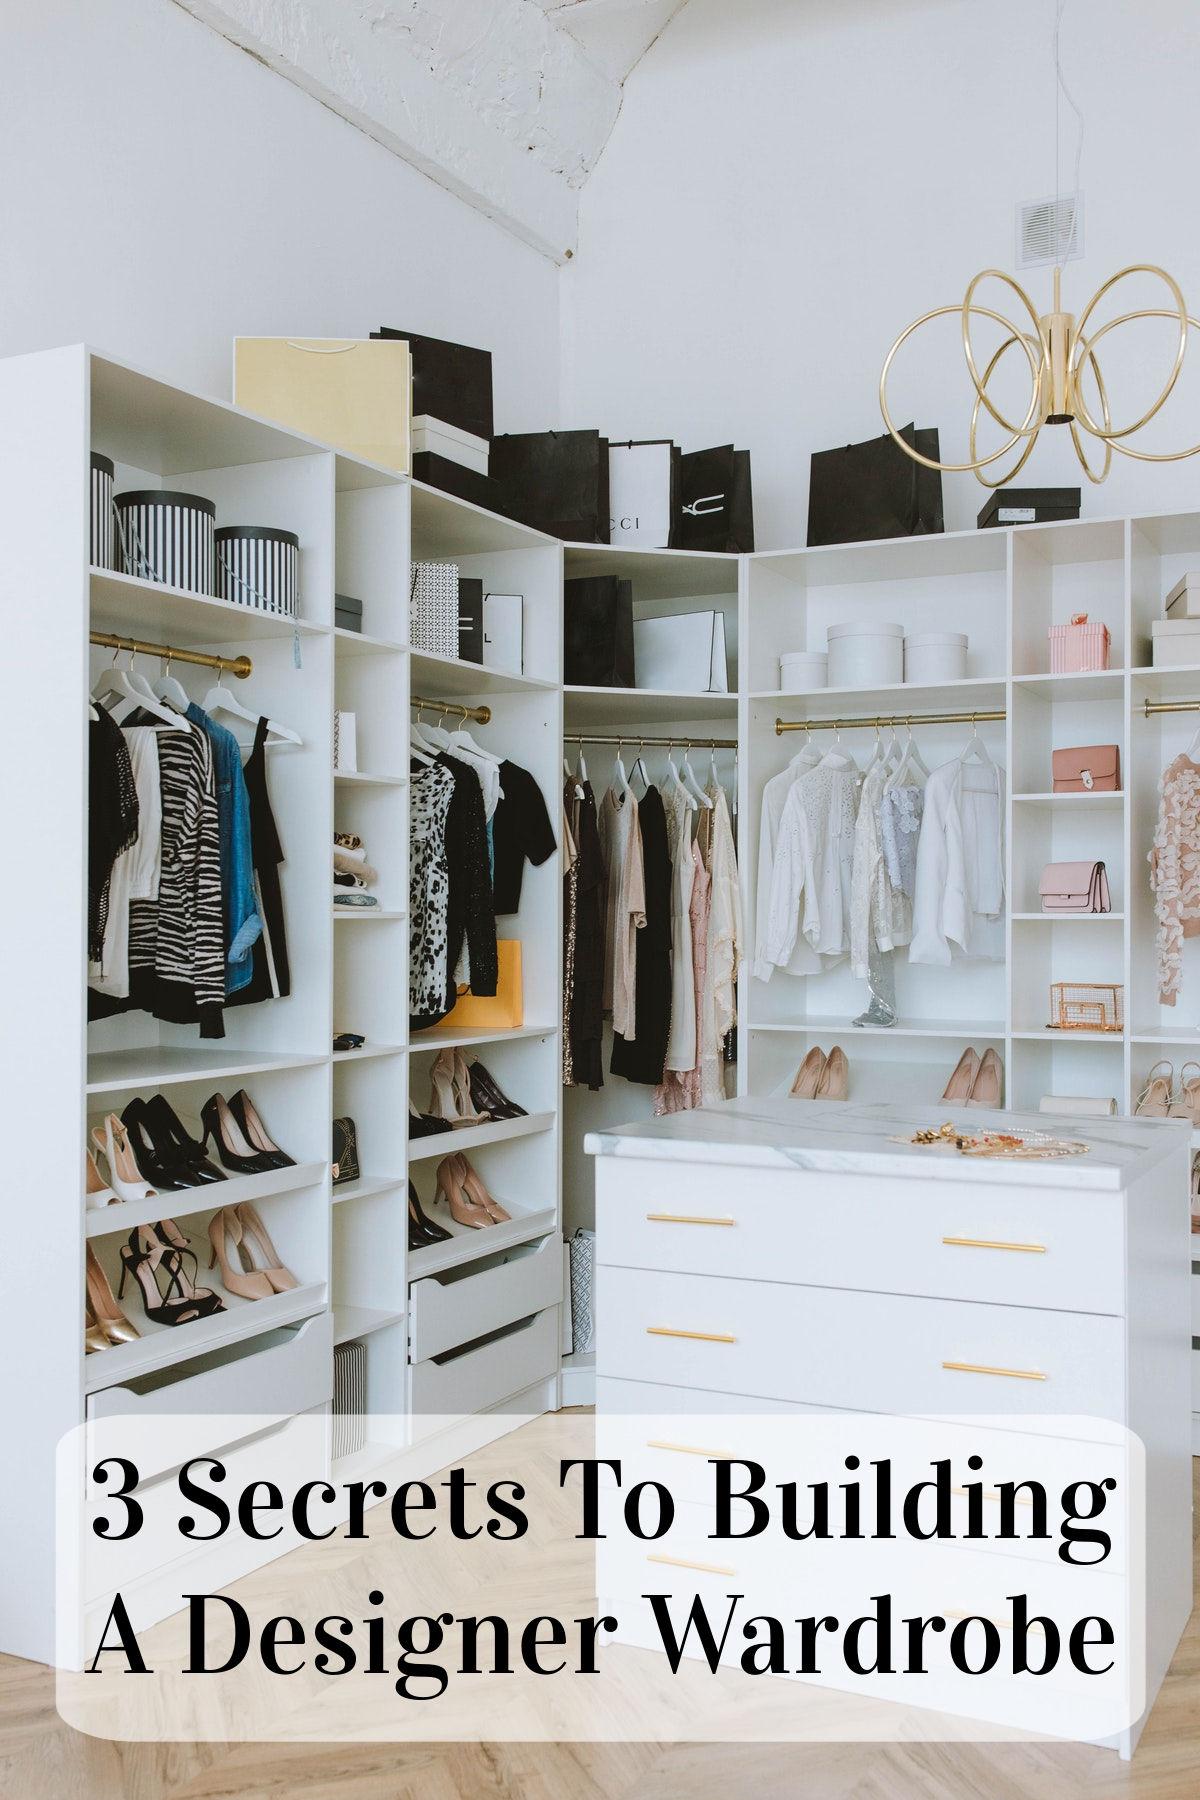 3 Secrets To Building A Designer Wardrobe